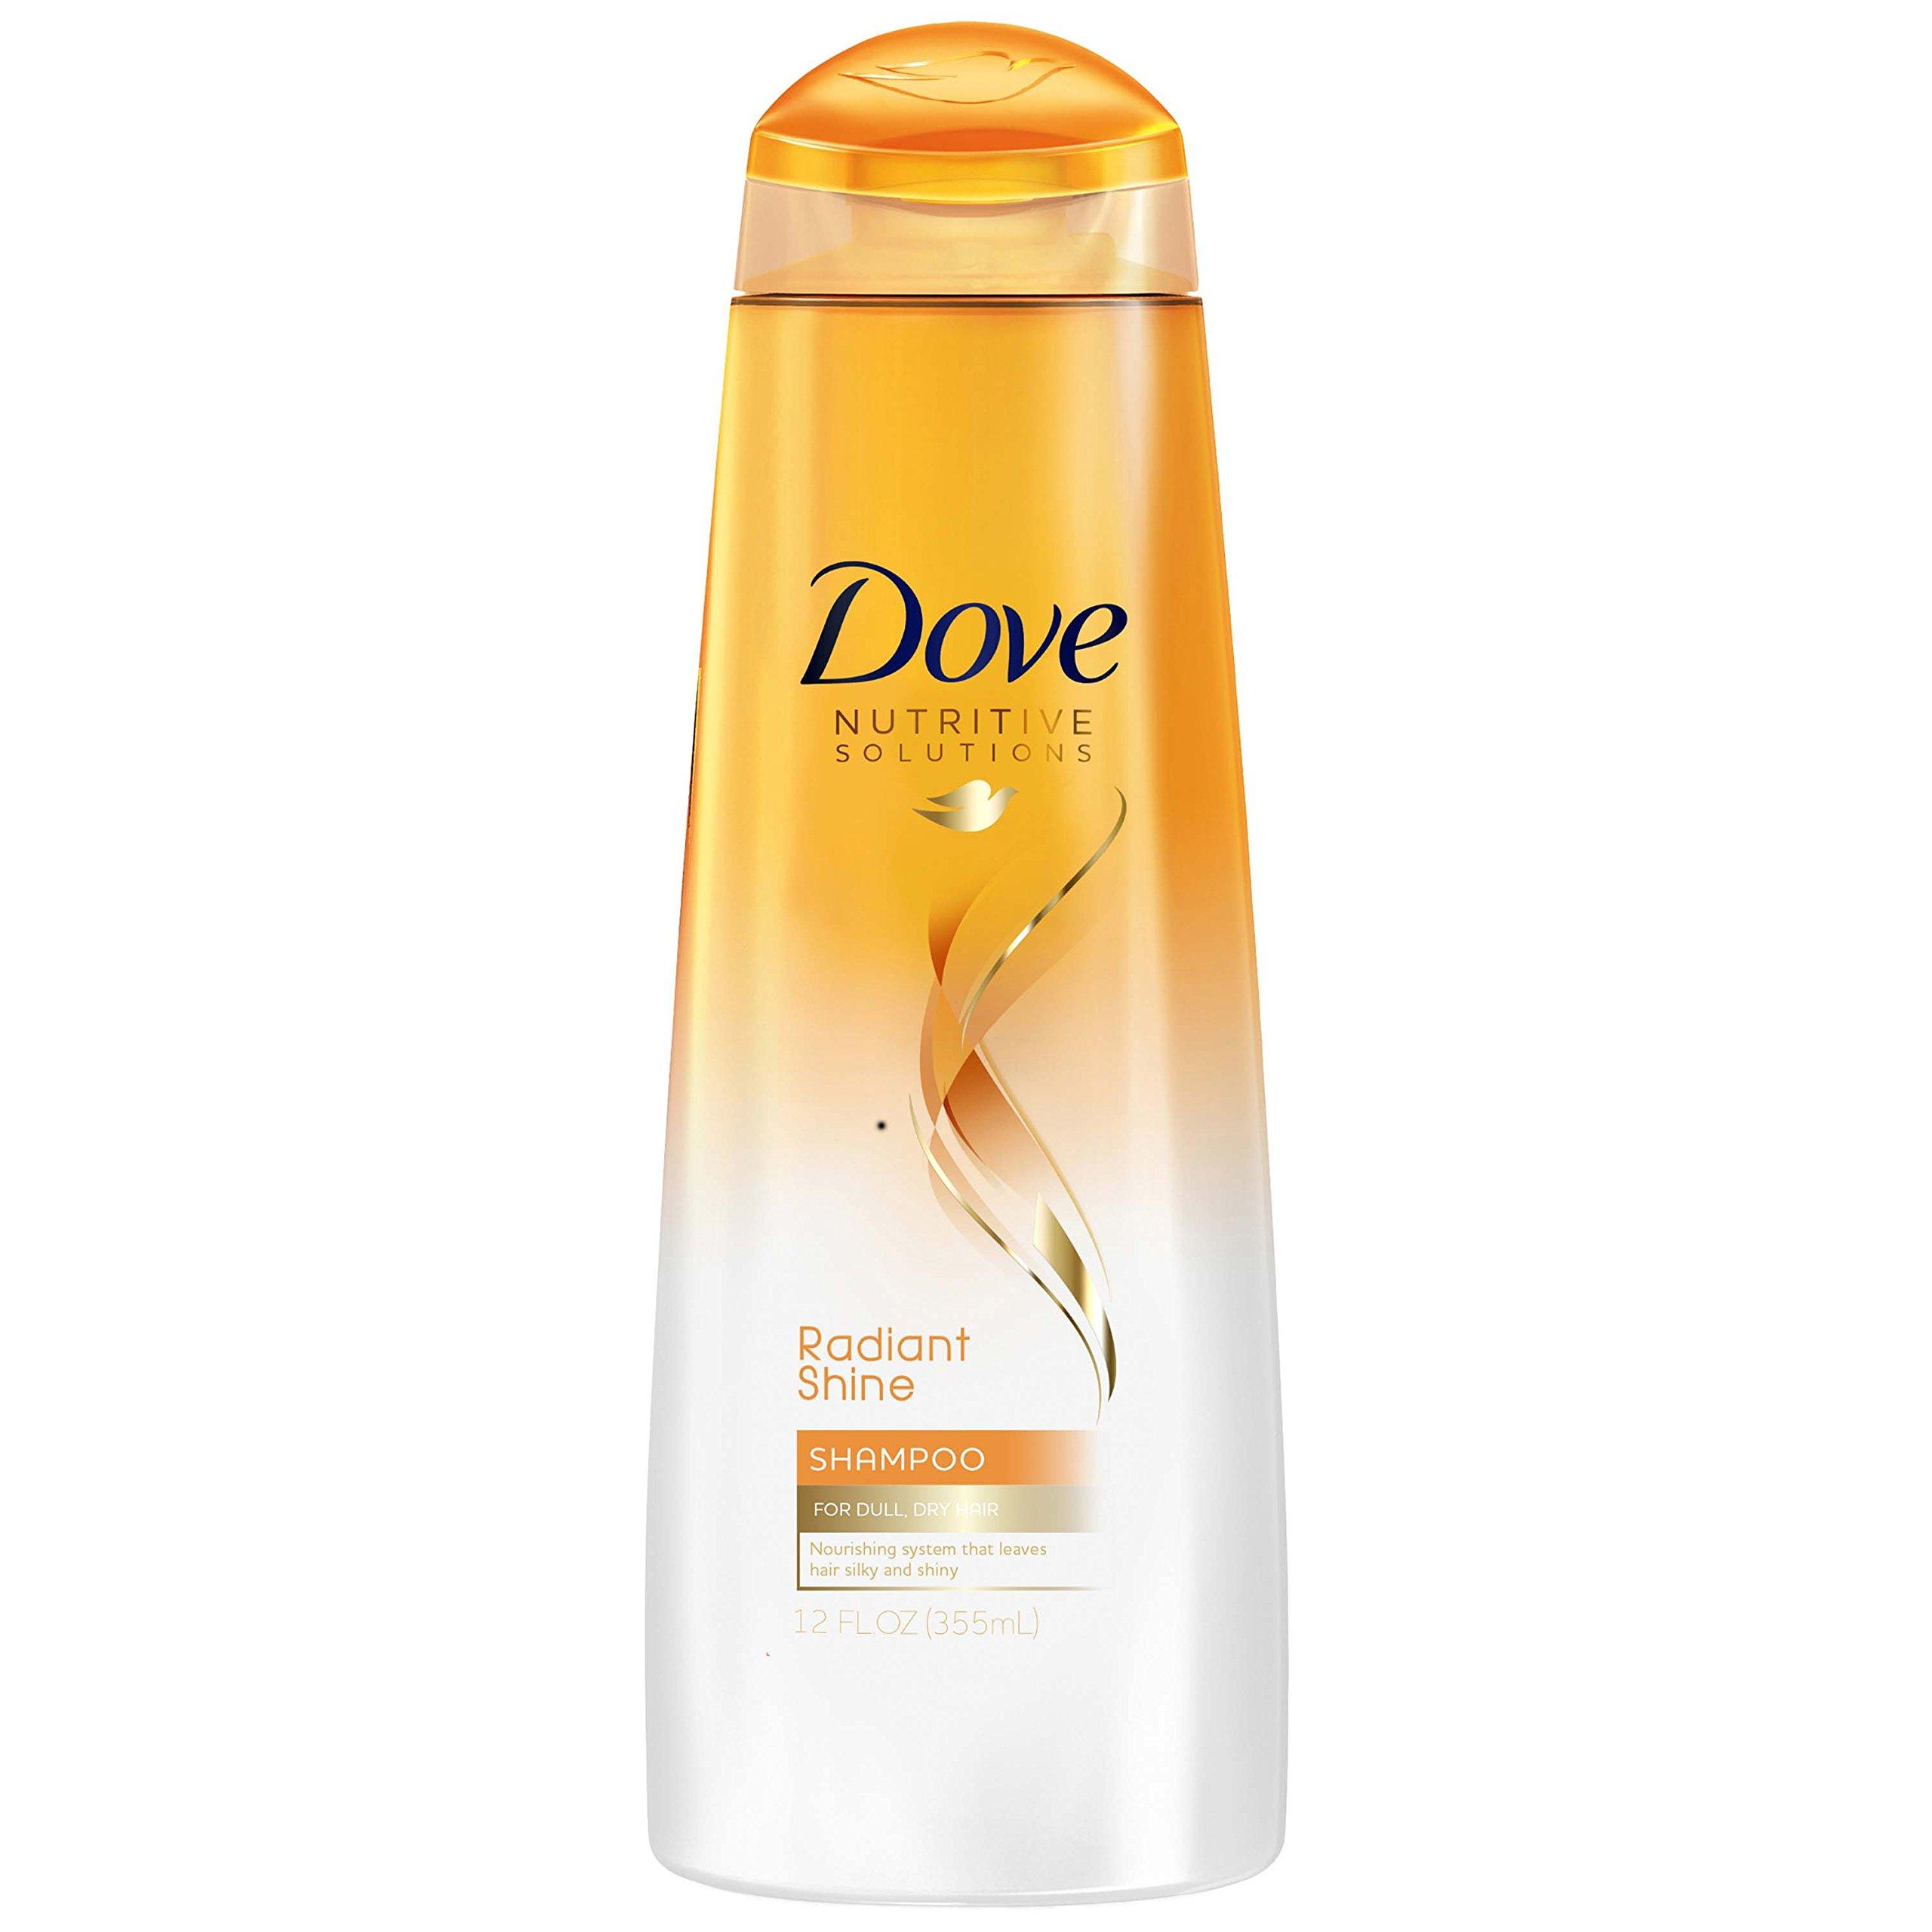 Dove Advanced Hair Series Shampoo, Radiant Shine 12 oz